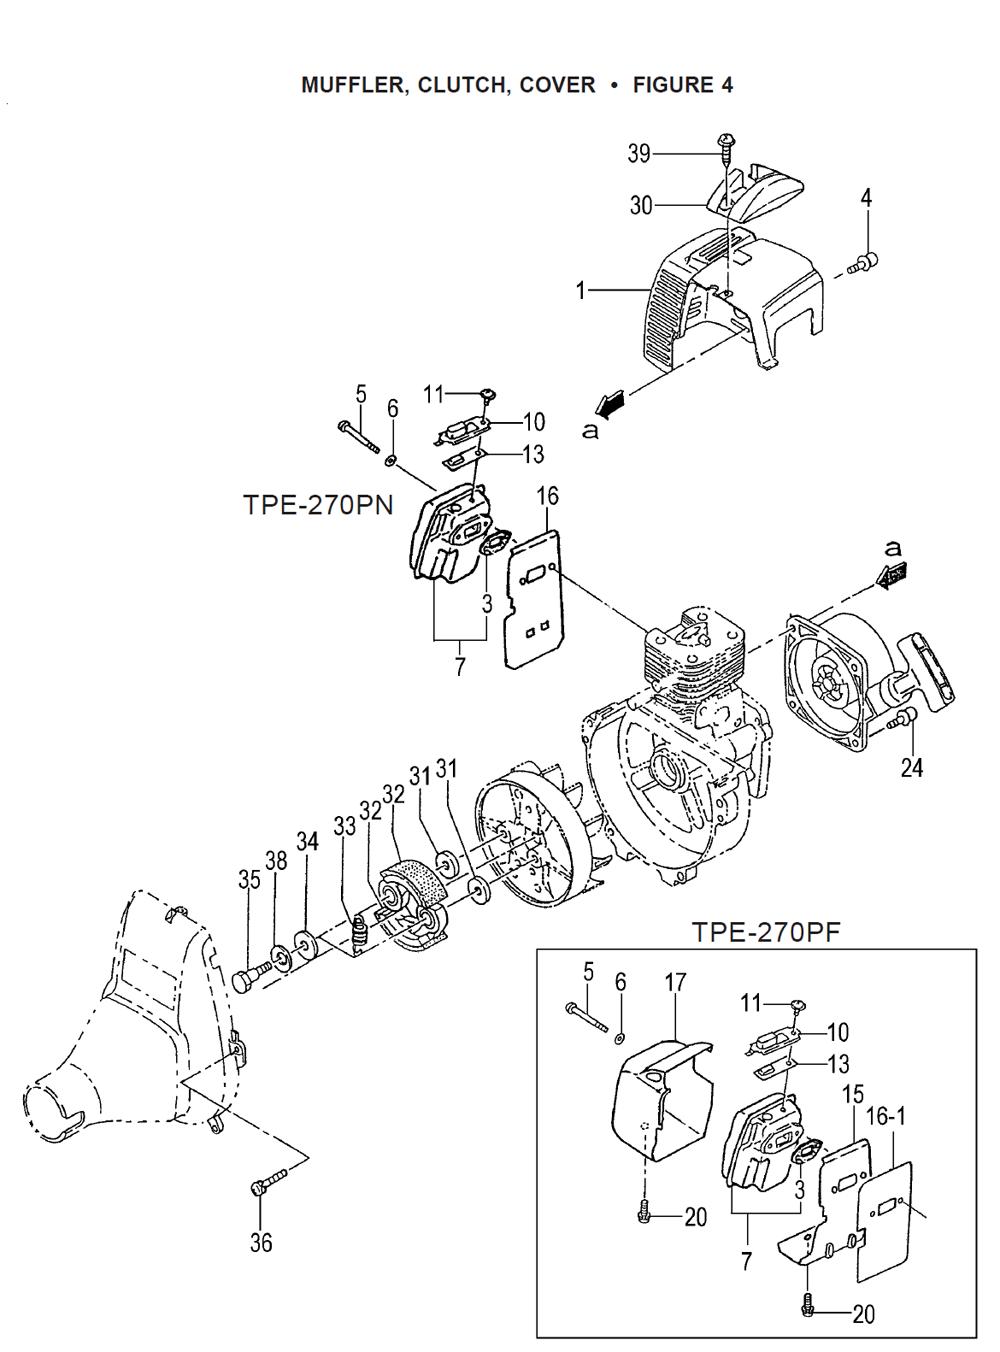 TPE-270PN-Tanaka-PB-3Break Down